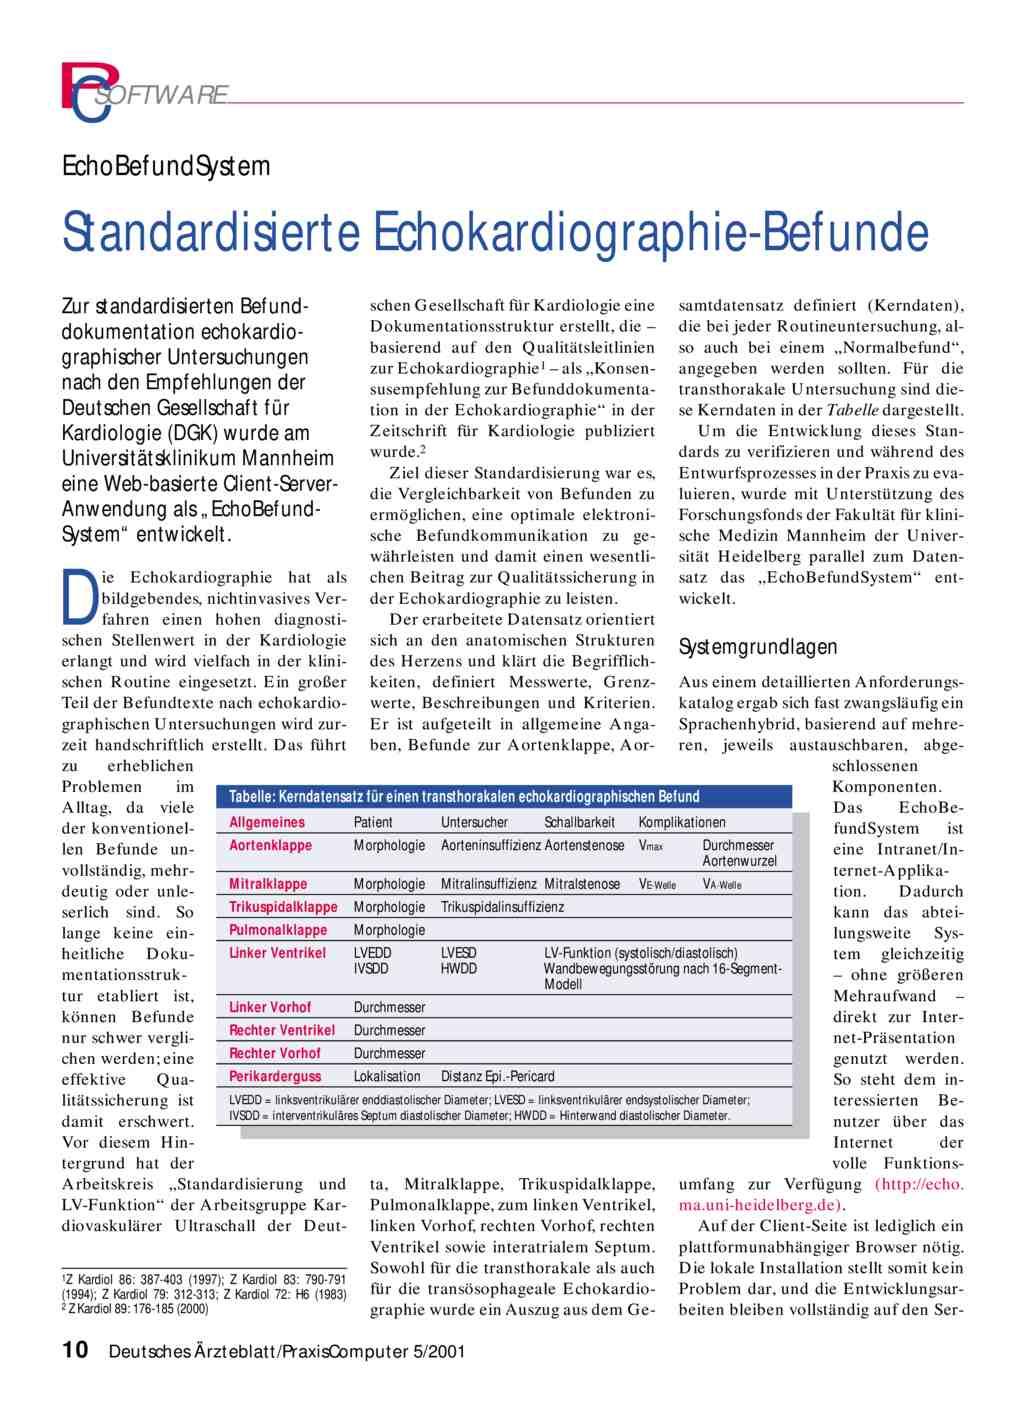 Echobefundsystem Standardisierte Echokardiographie Befunde